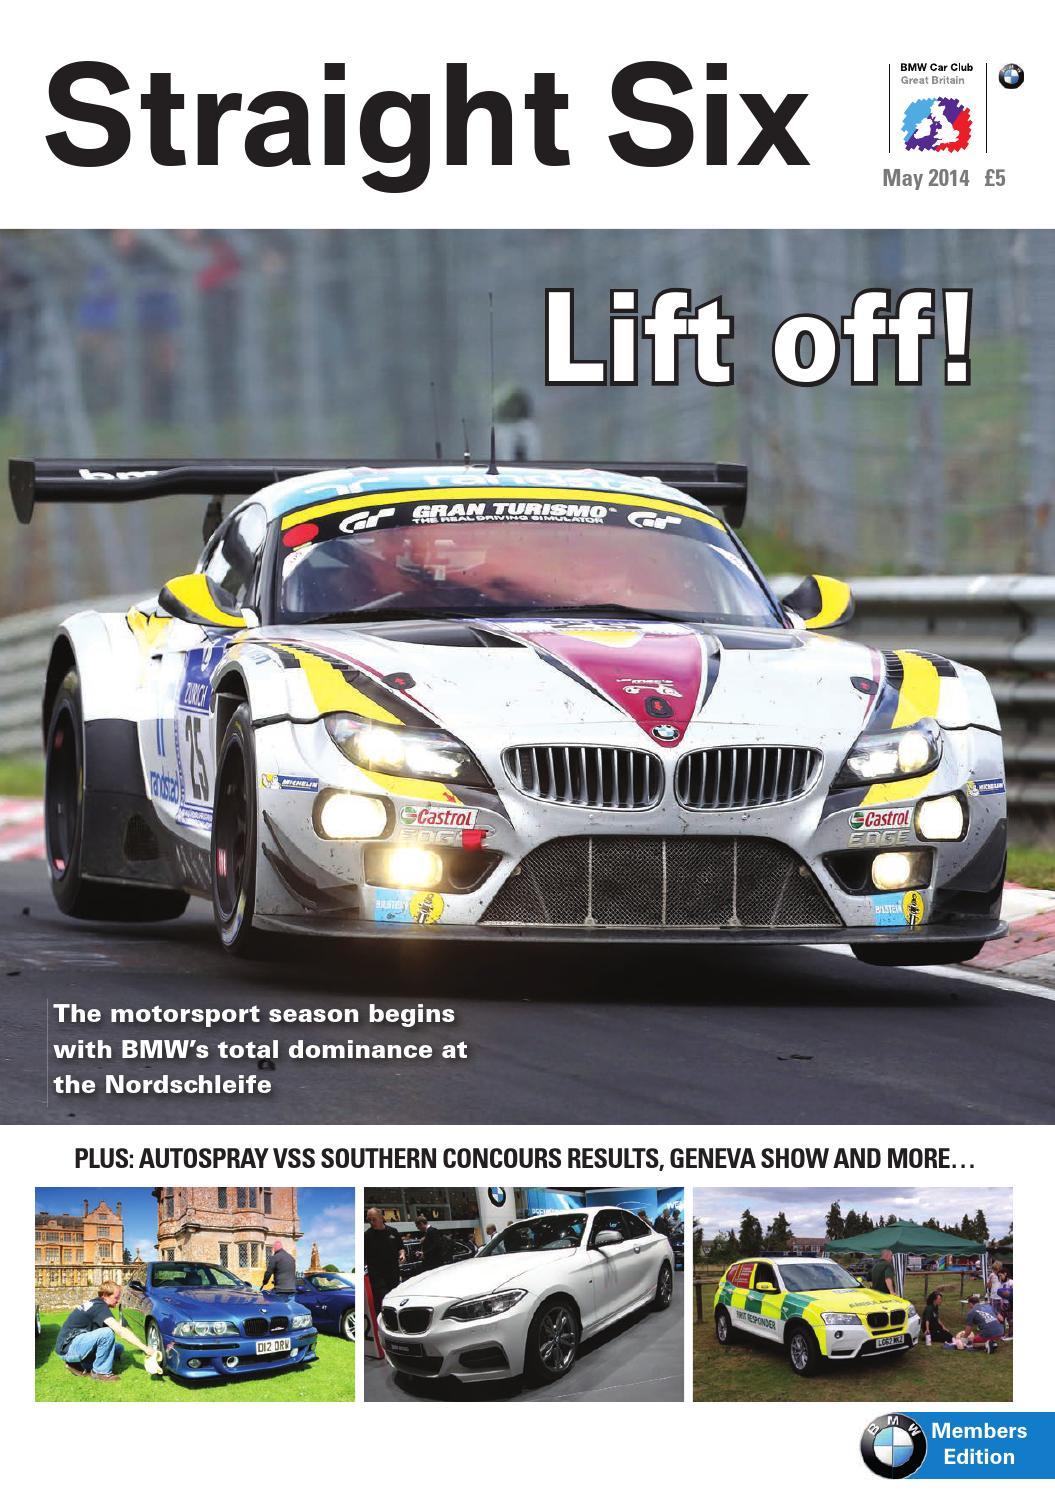 BMW RACING PREMIUM CAR SEAT COVERS PROTECTORS 100/% WATERPROOF //FITS BMW i3